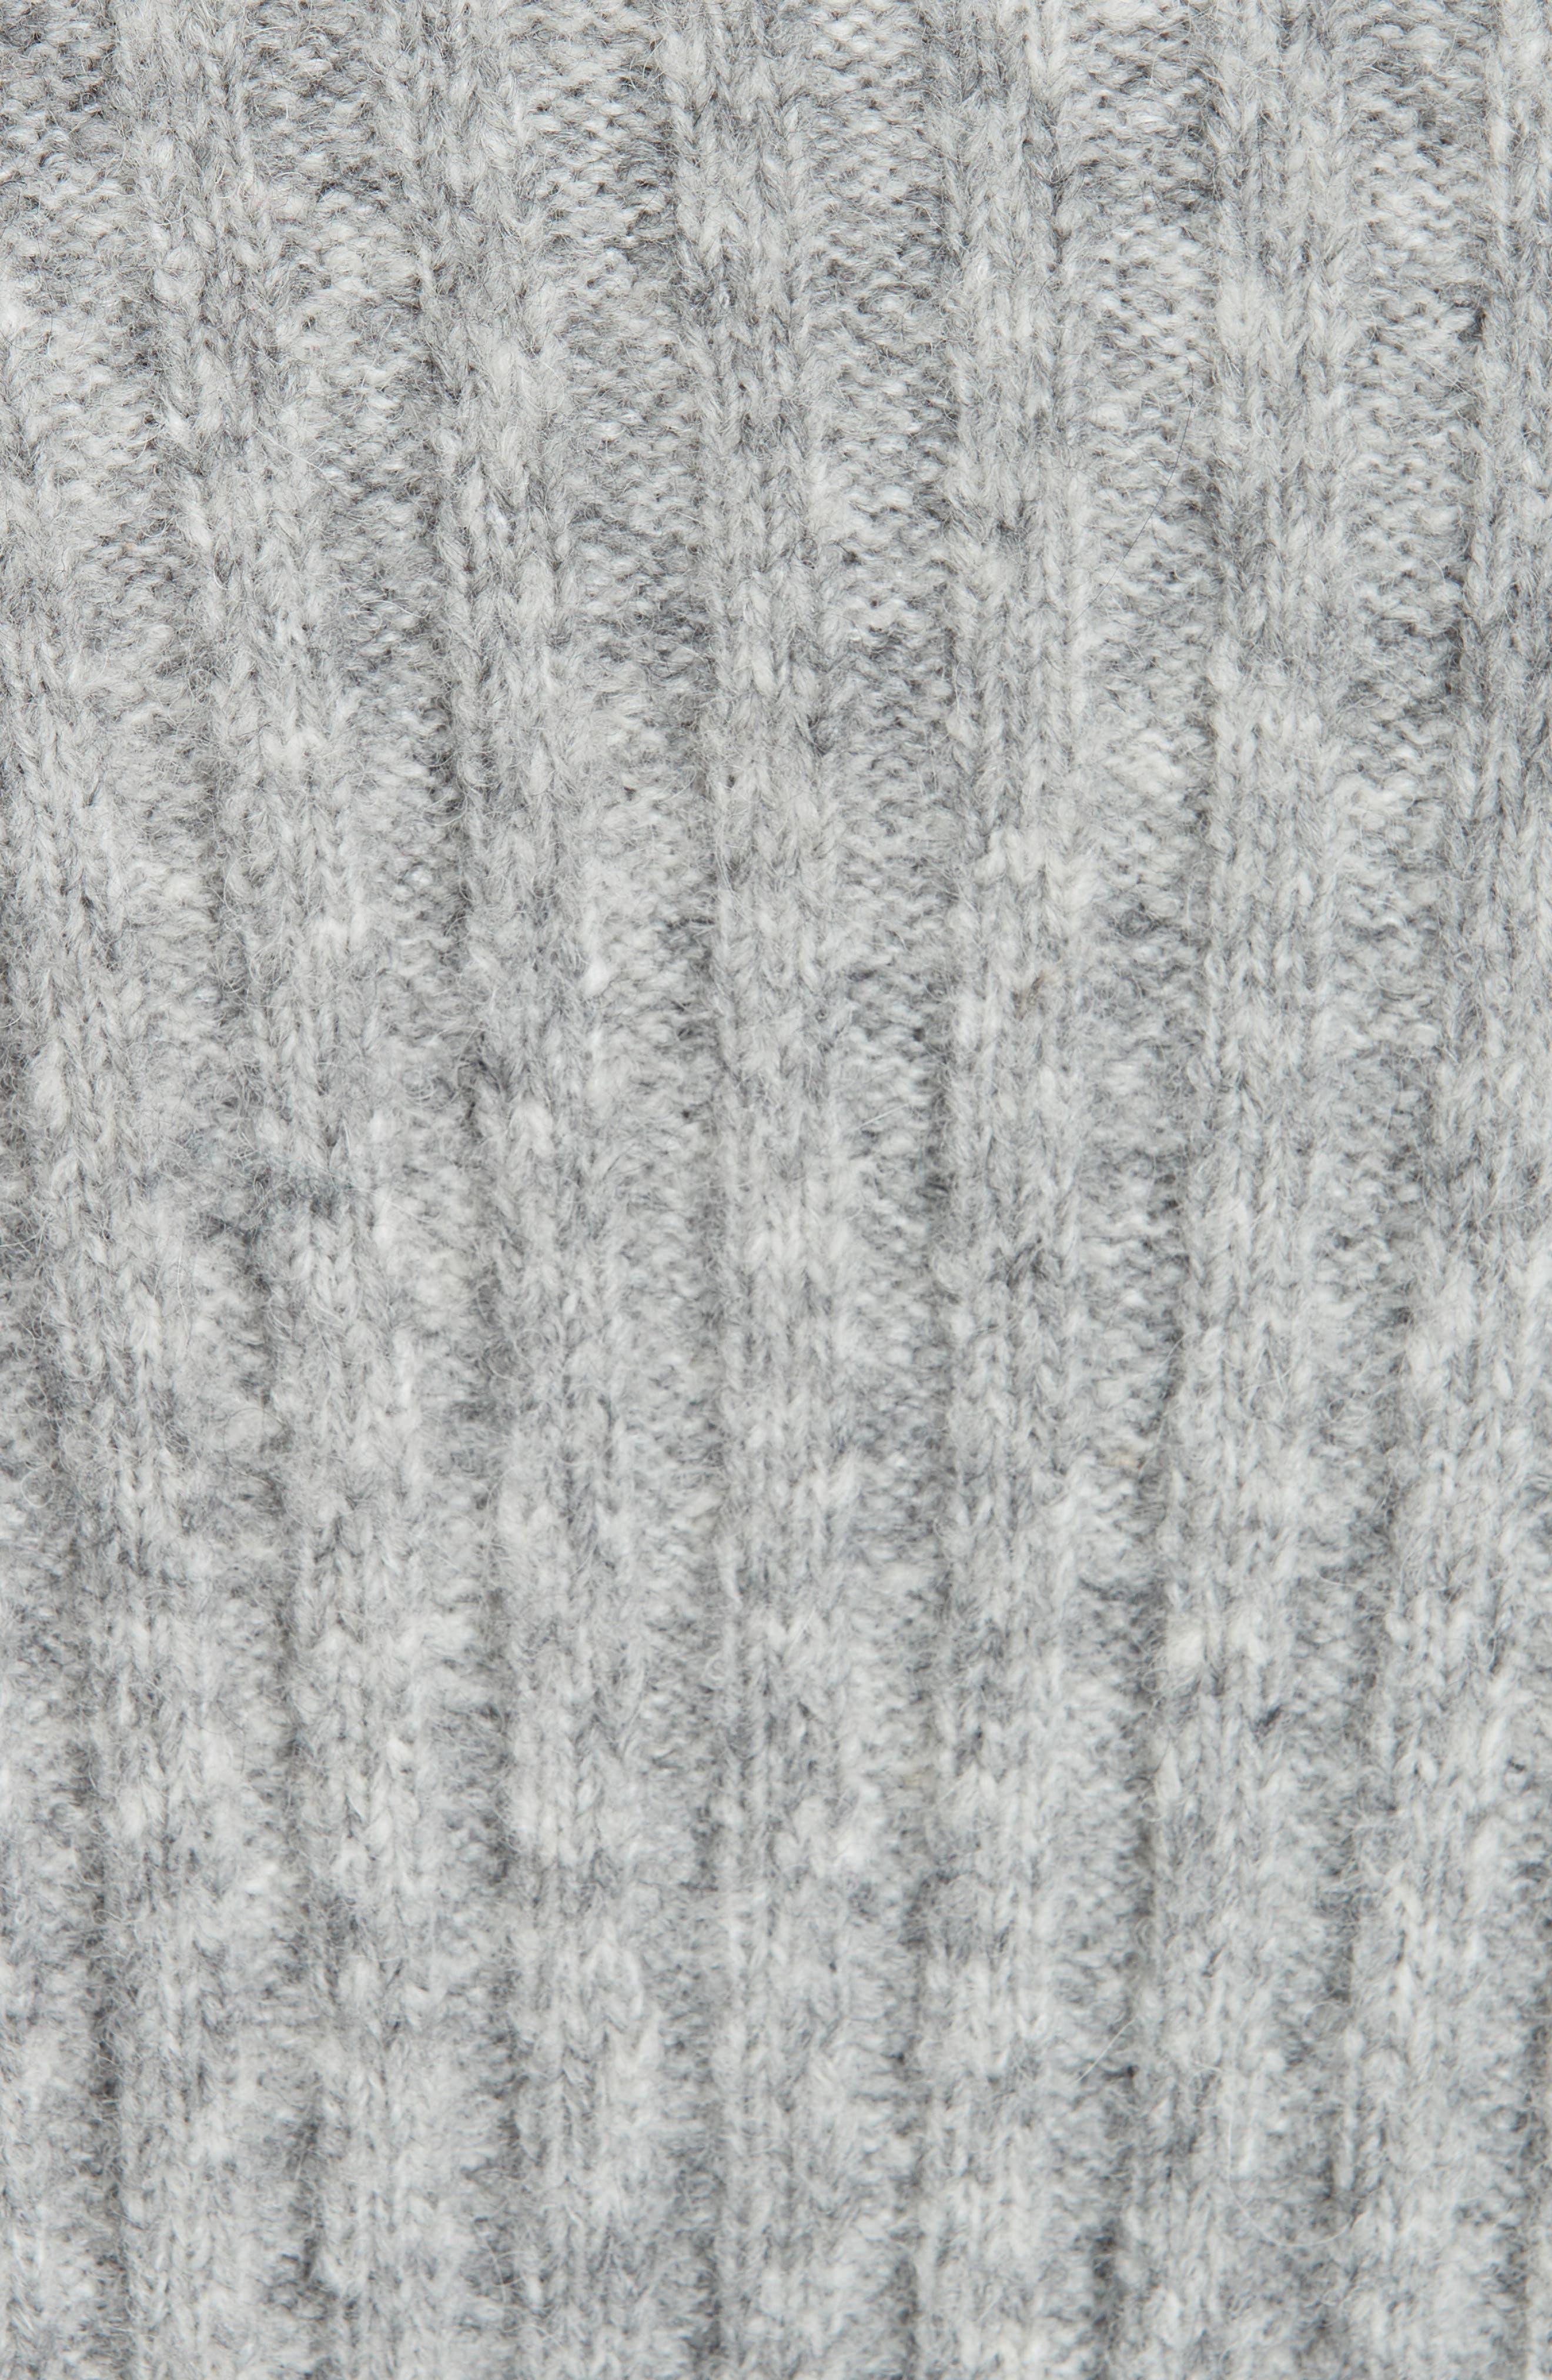 REBECCA TAYLOR,                             Lofty Alpaca Wool Blend Sweater,                             Alternate thumbnail 5, color,                             052